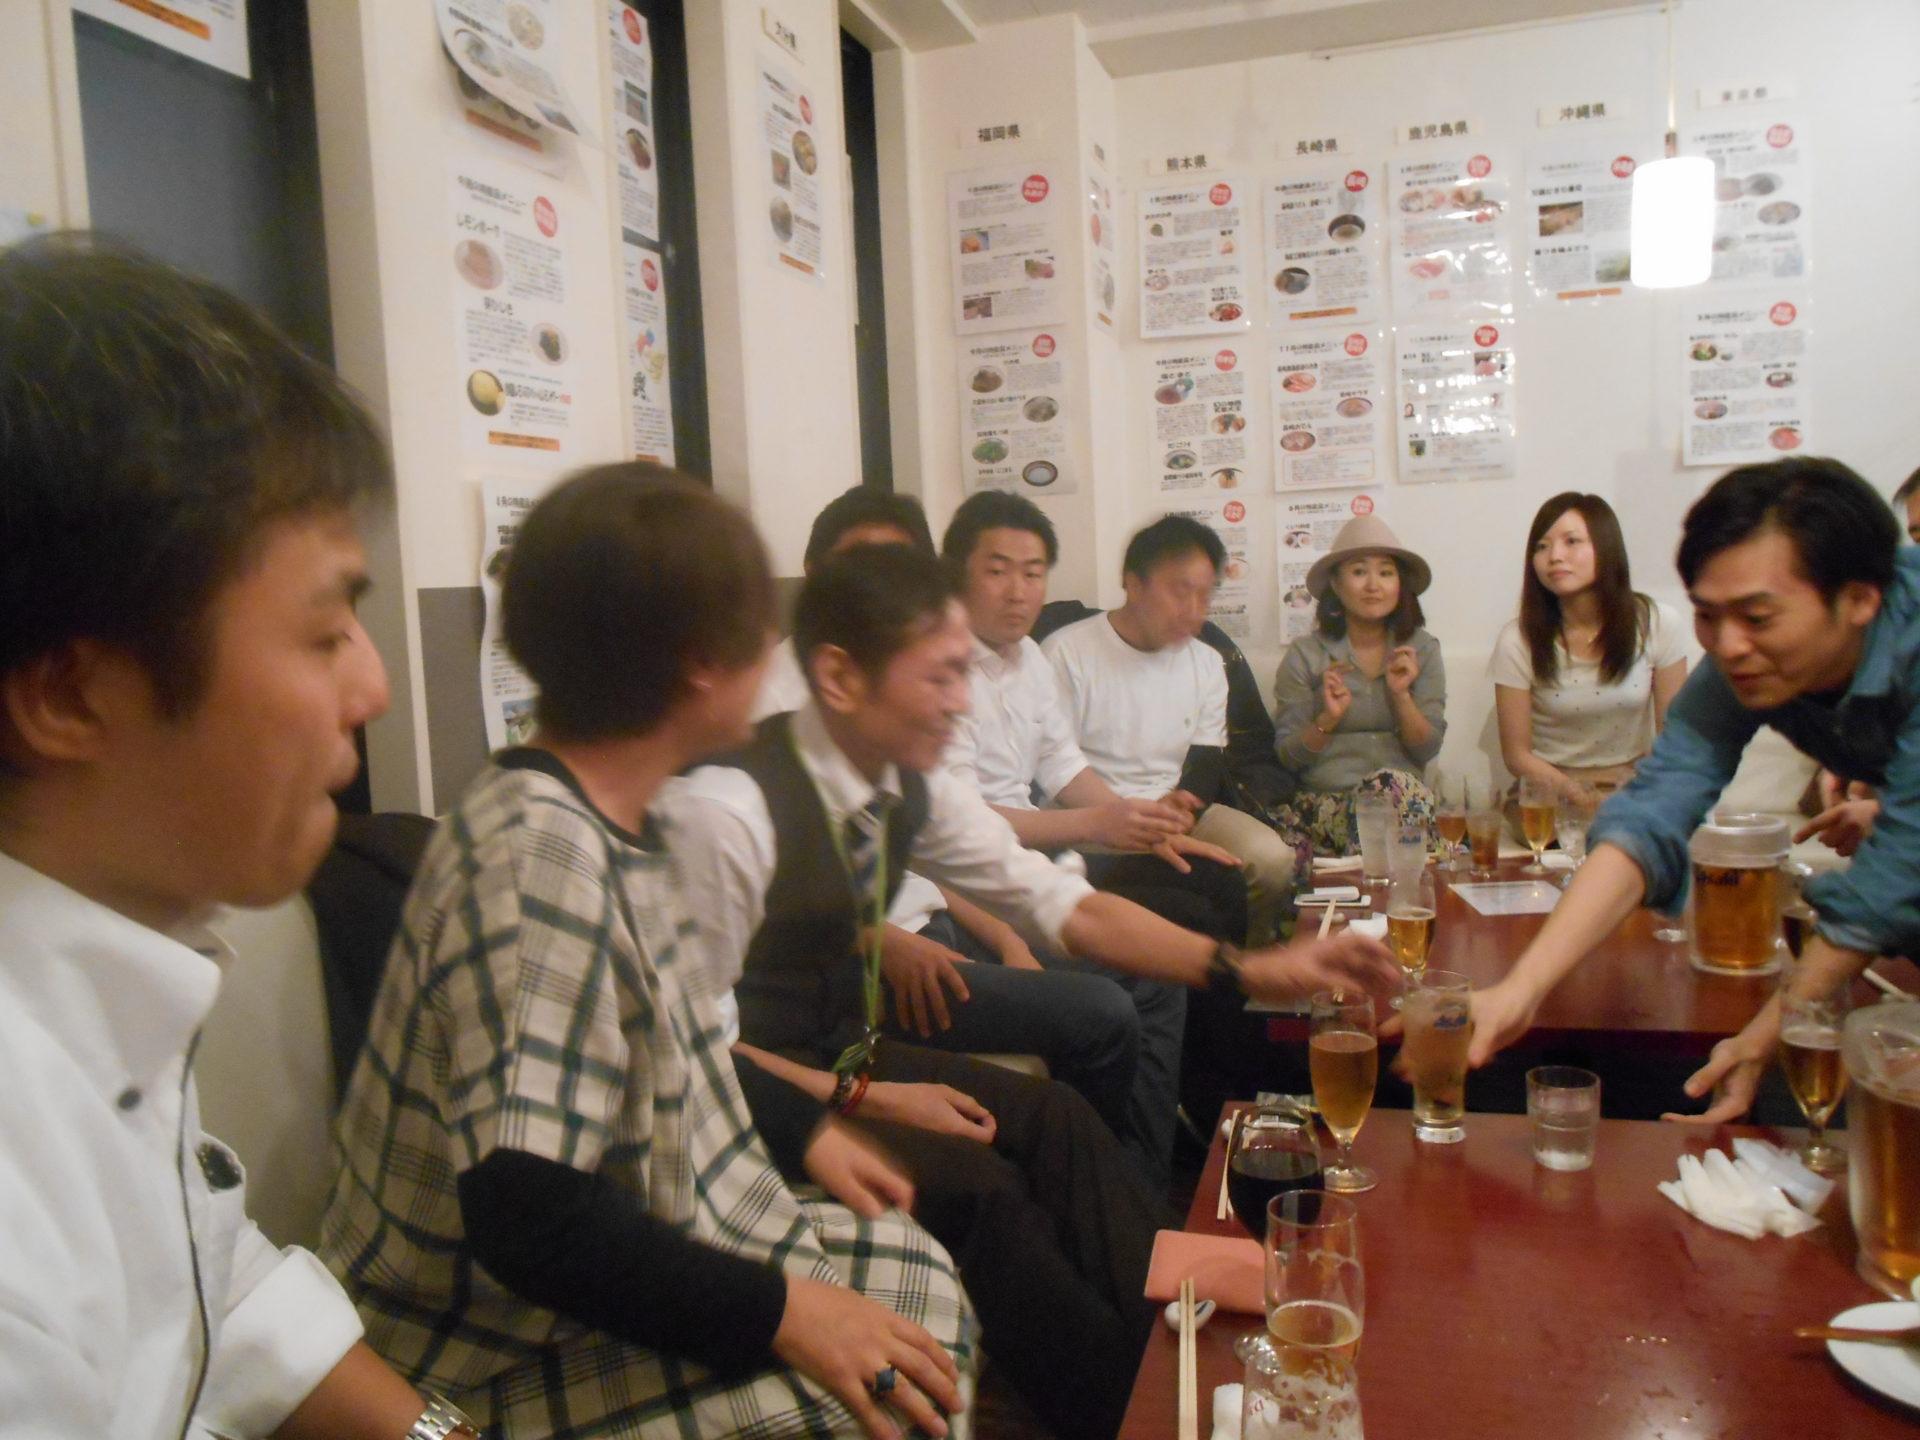 DSCN5993 1920x1440 - 2015年10月19日 AOsuki定例飲み会開催しました。